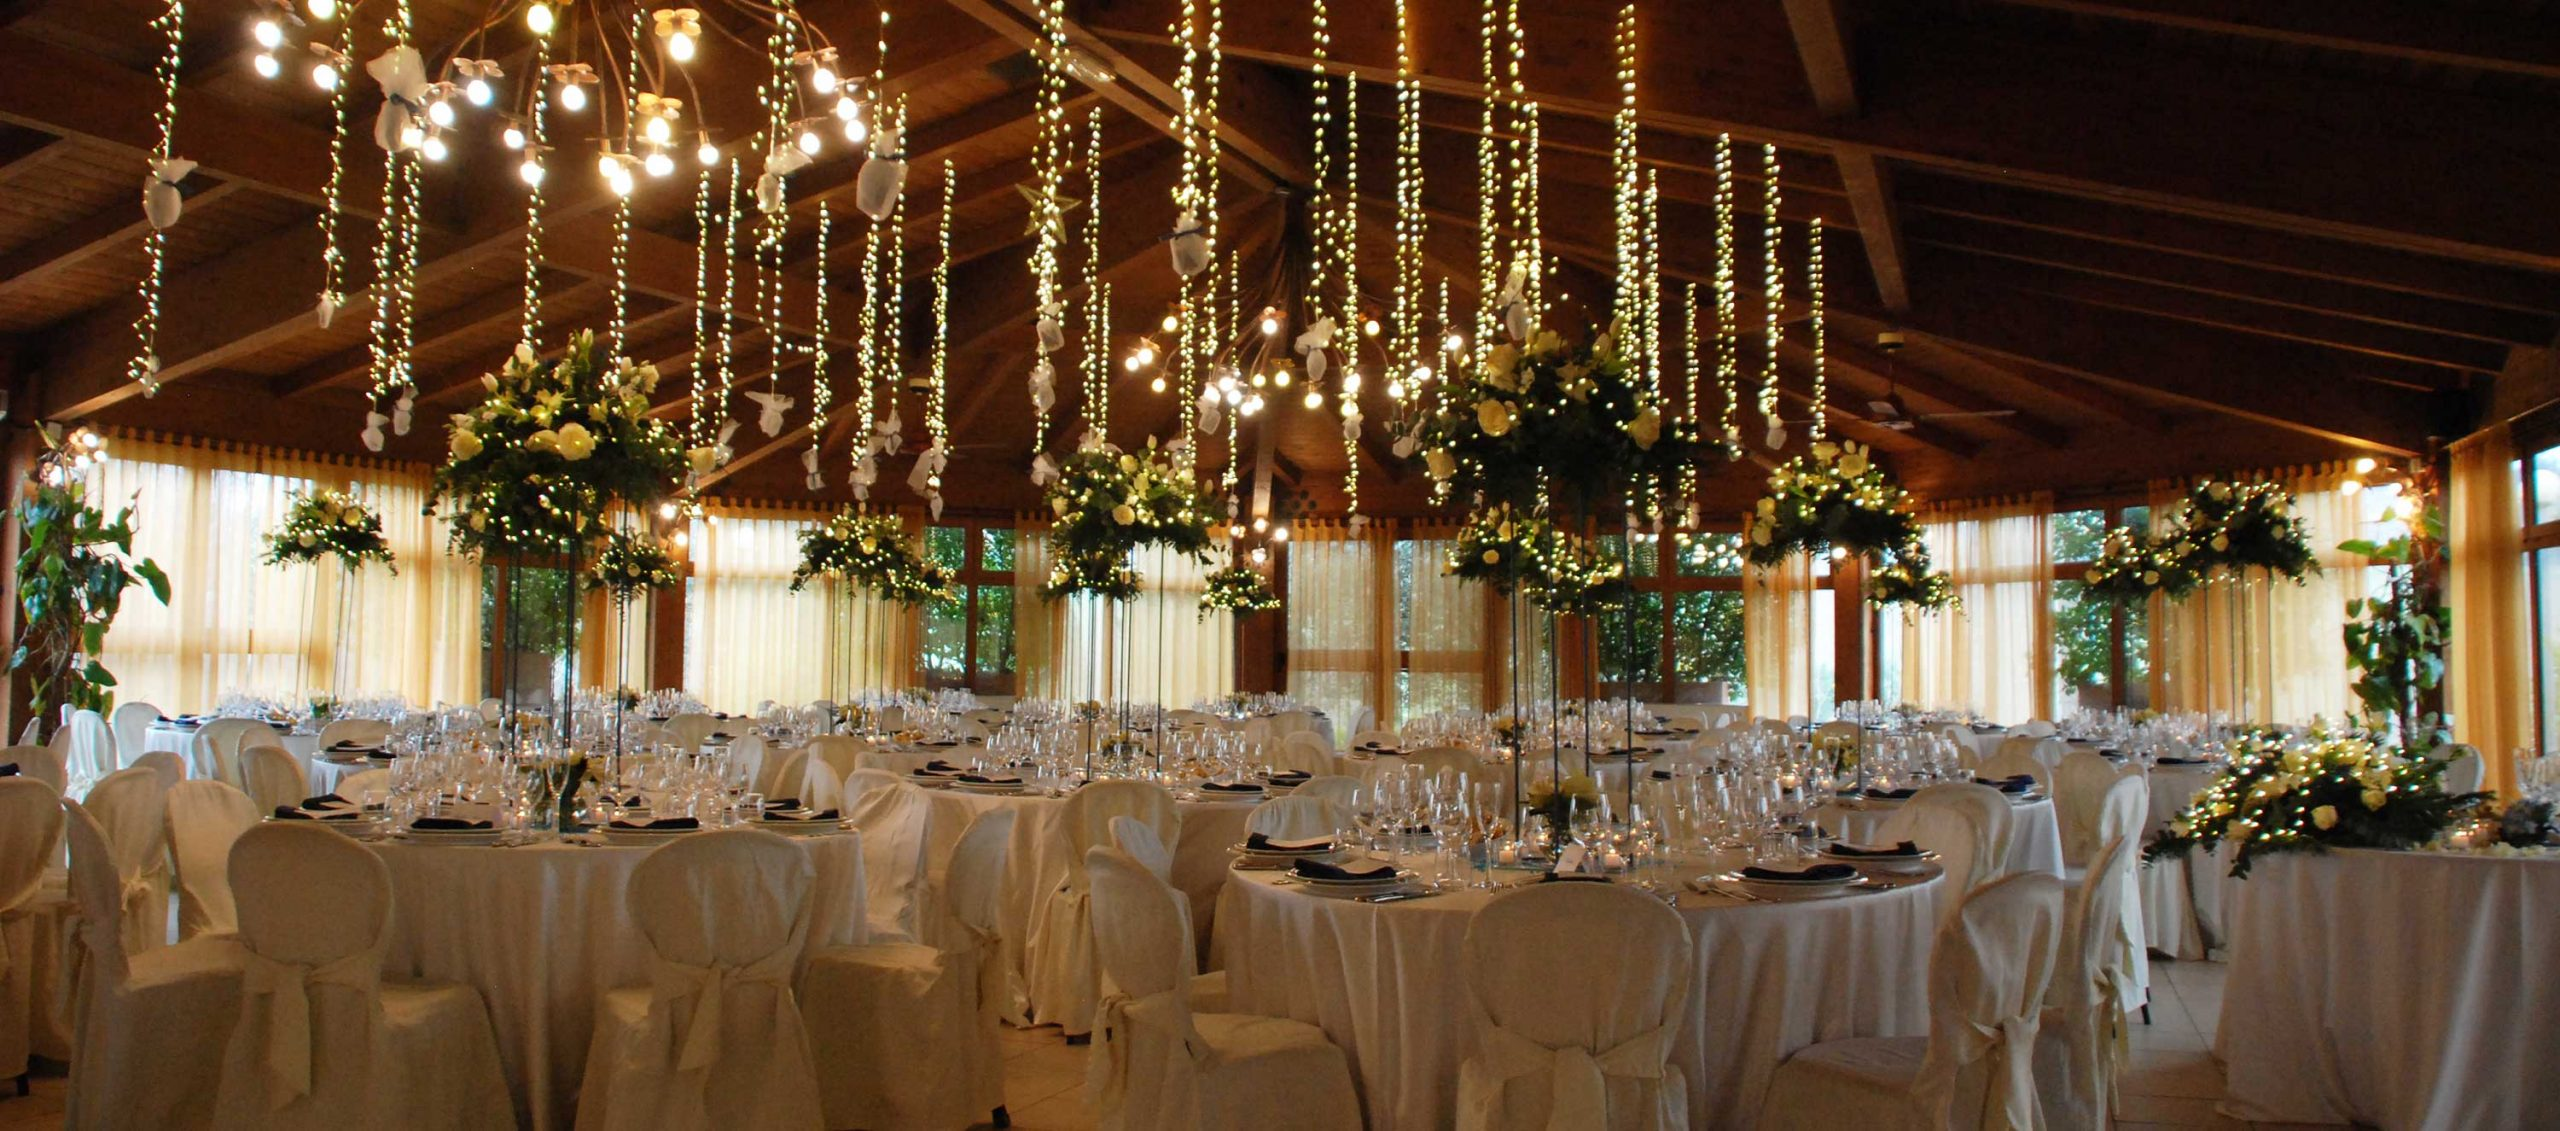 ristorante cerimonie eventi perugia